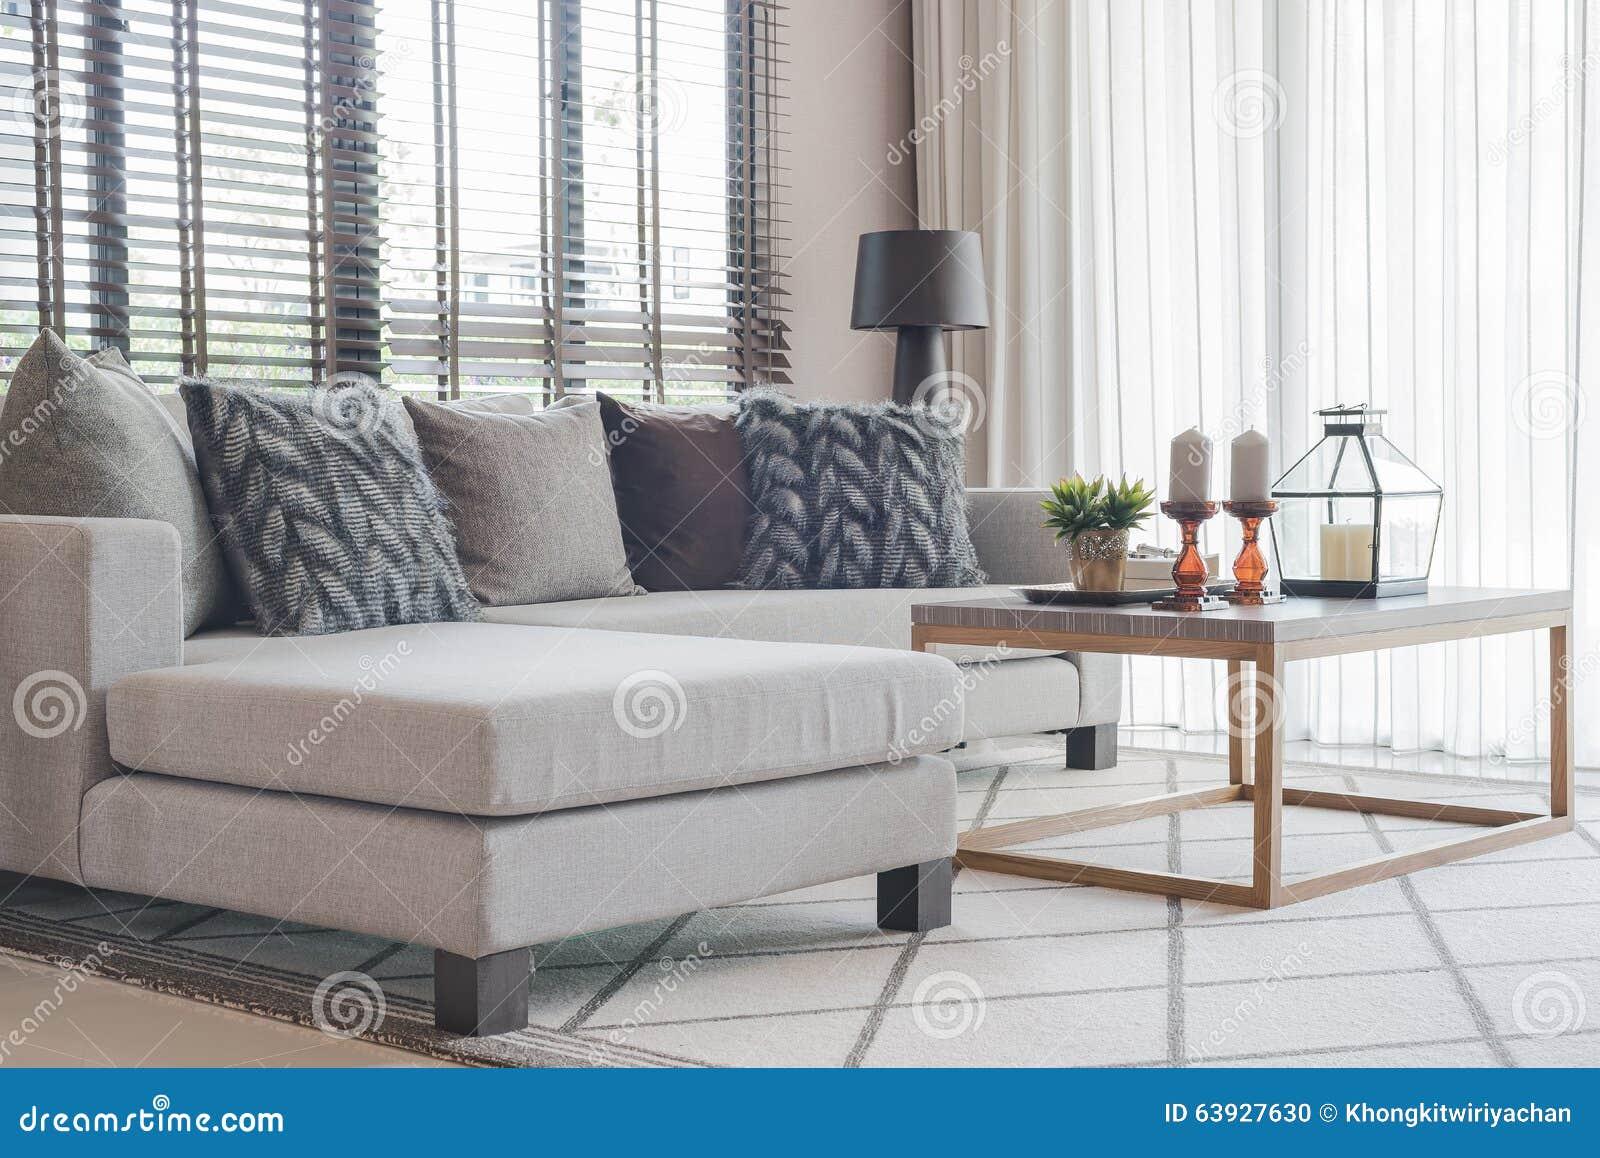 Moderne woonkamer met moderne grijze bank en houten lijst stock foto afbeelding 63927630 - Moderne eetkamer en woonkamer ...